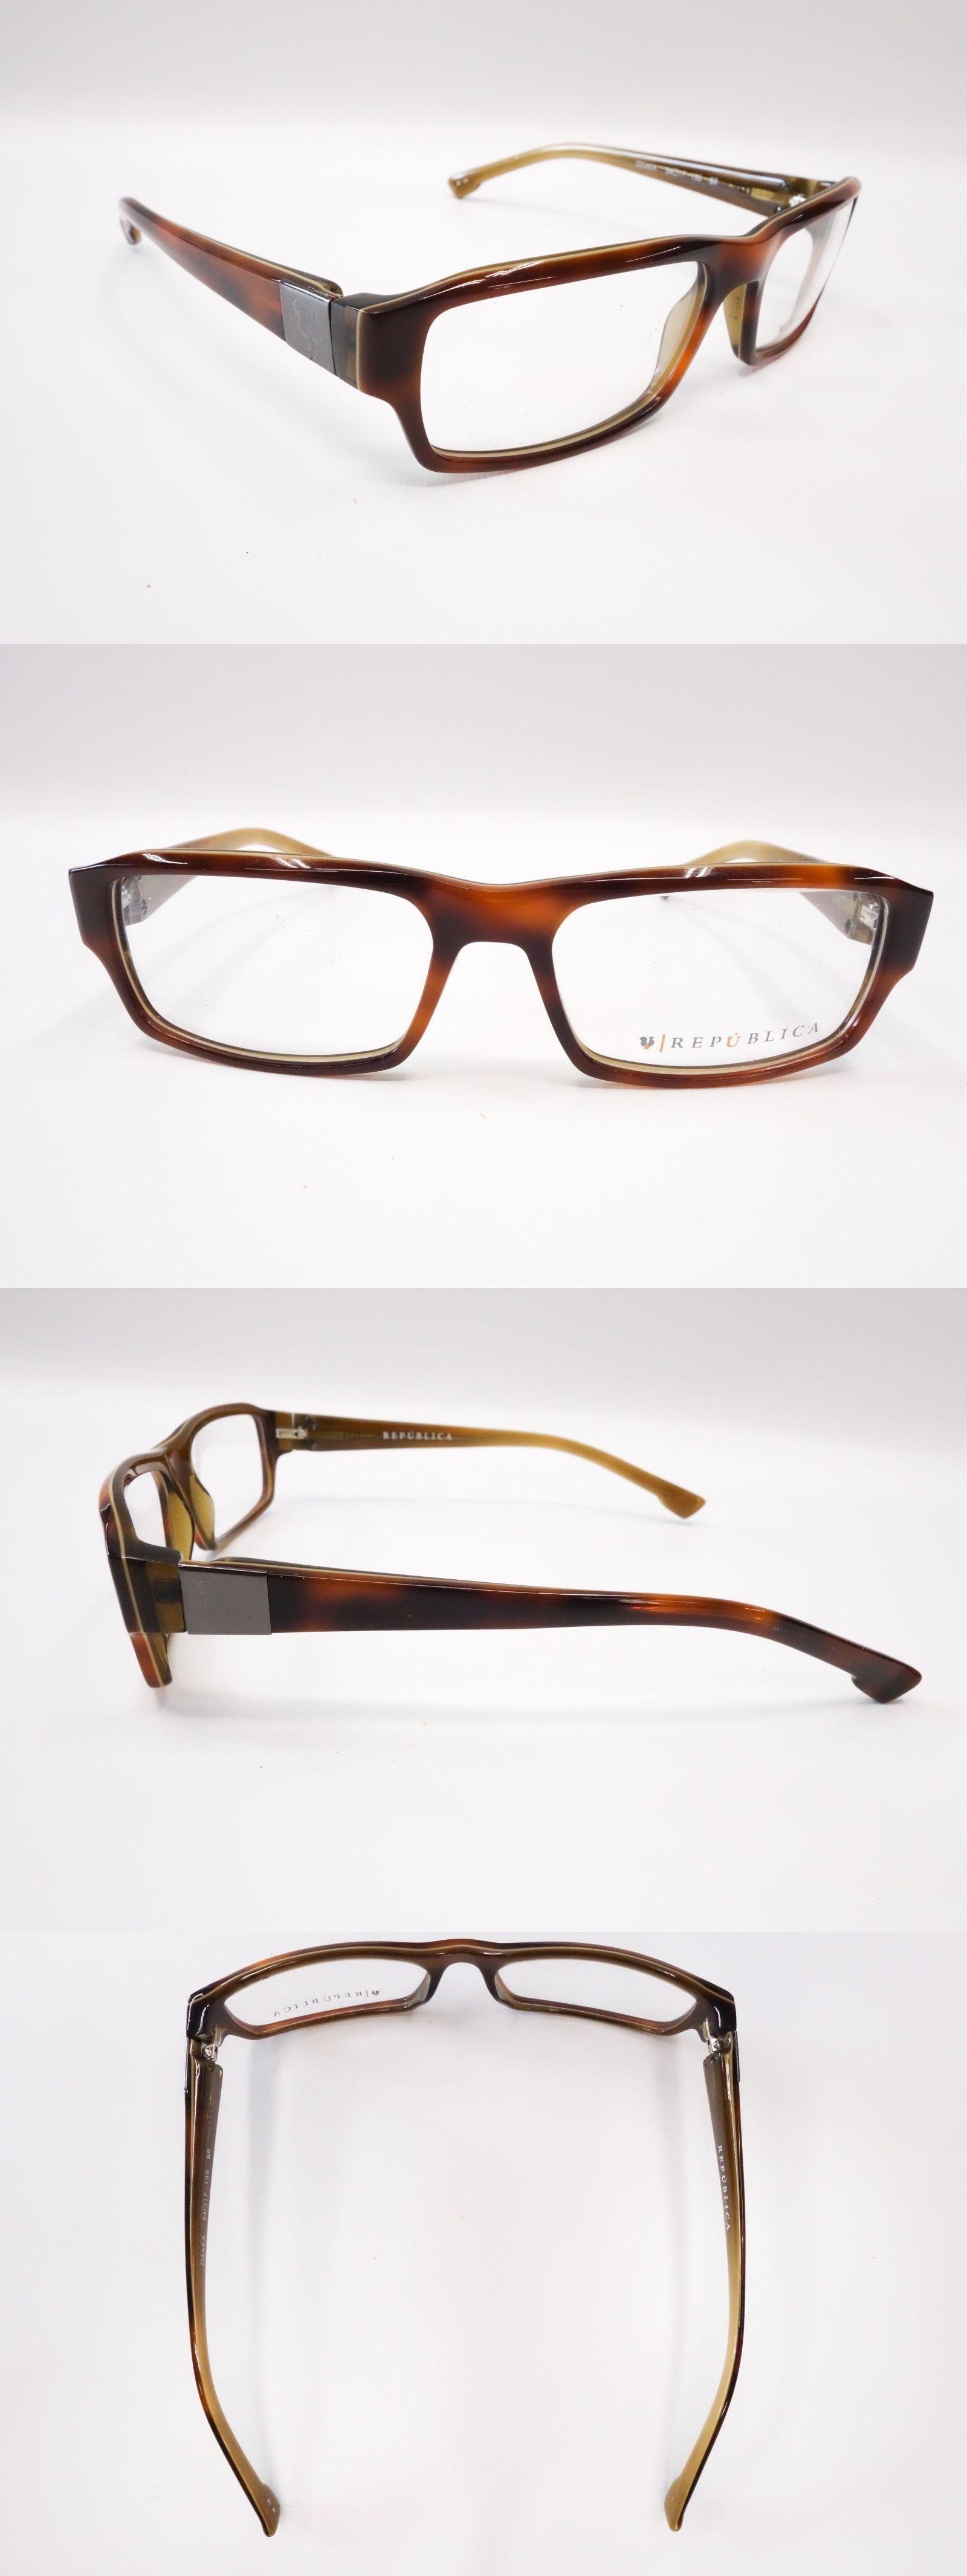 Eyewear Accessories 179249: New Republica Osaka Rx Eyeglasses Frames ...